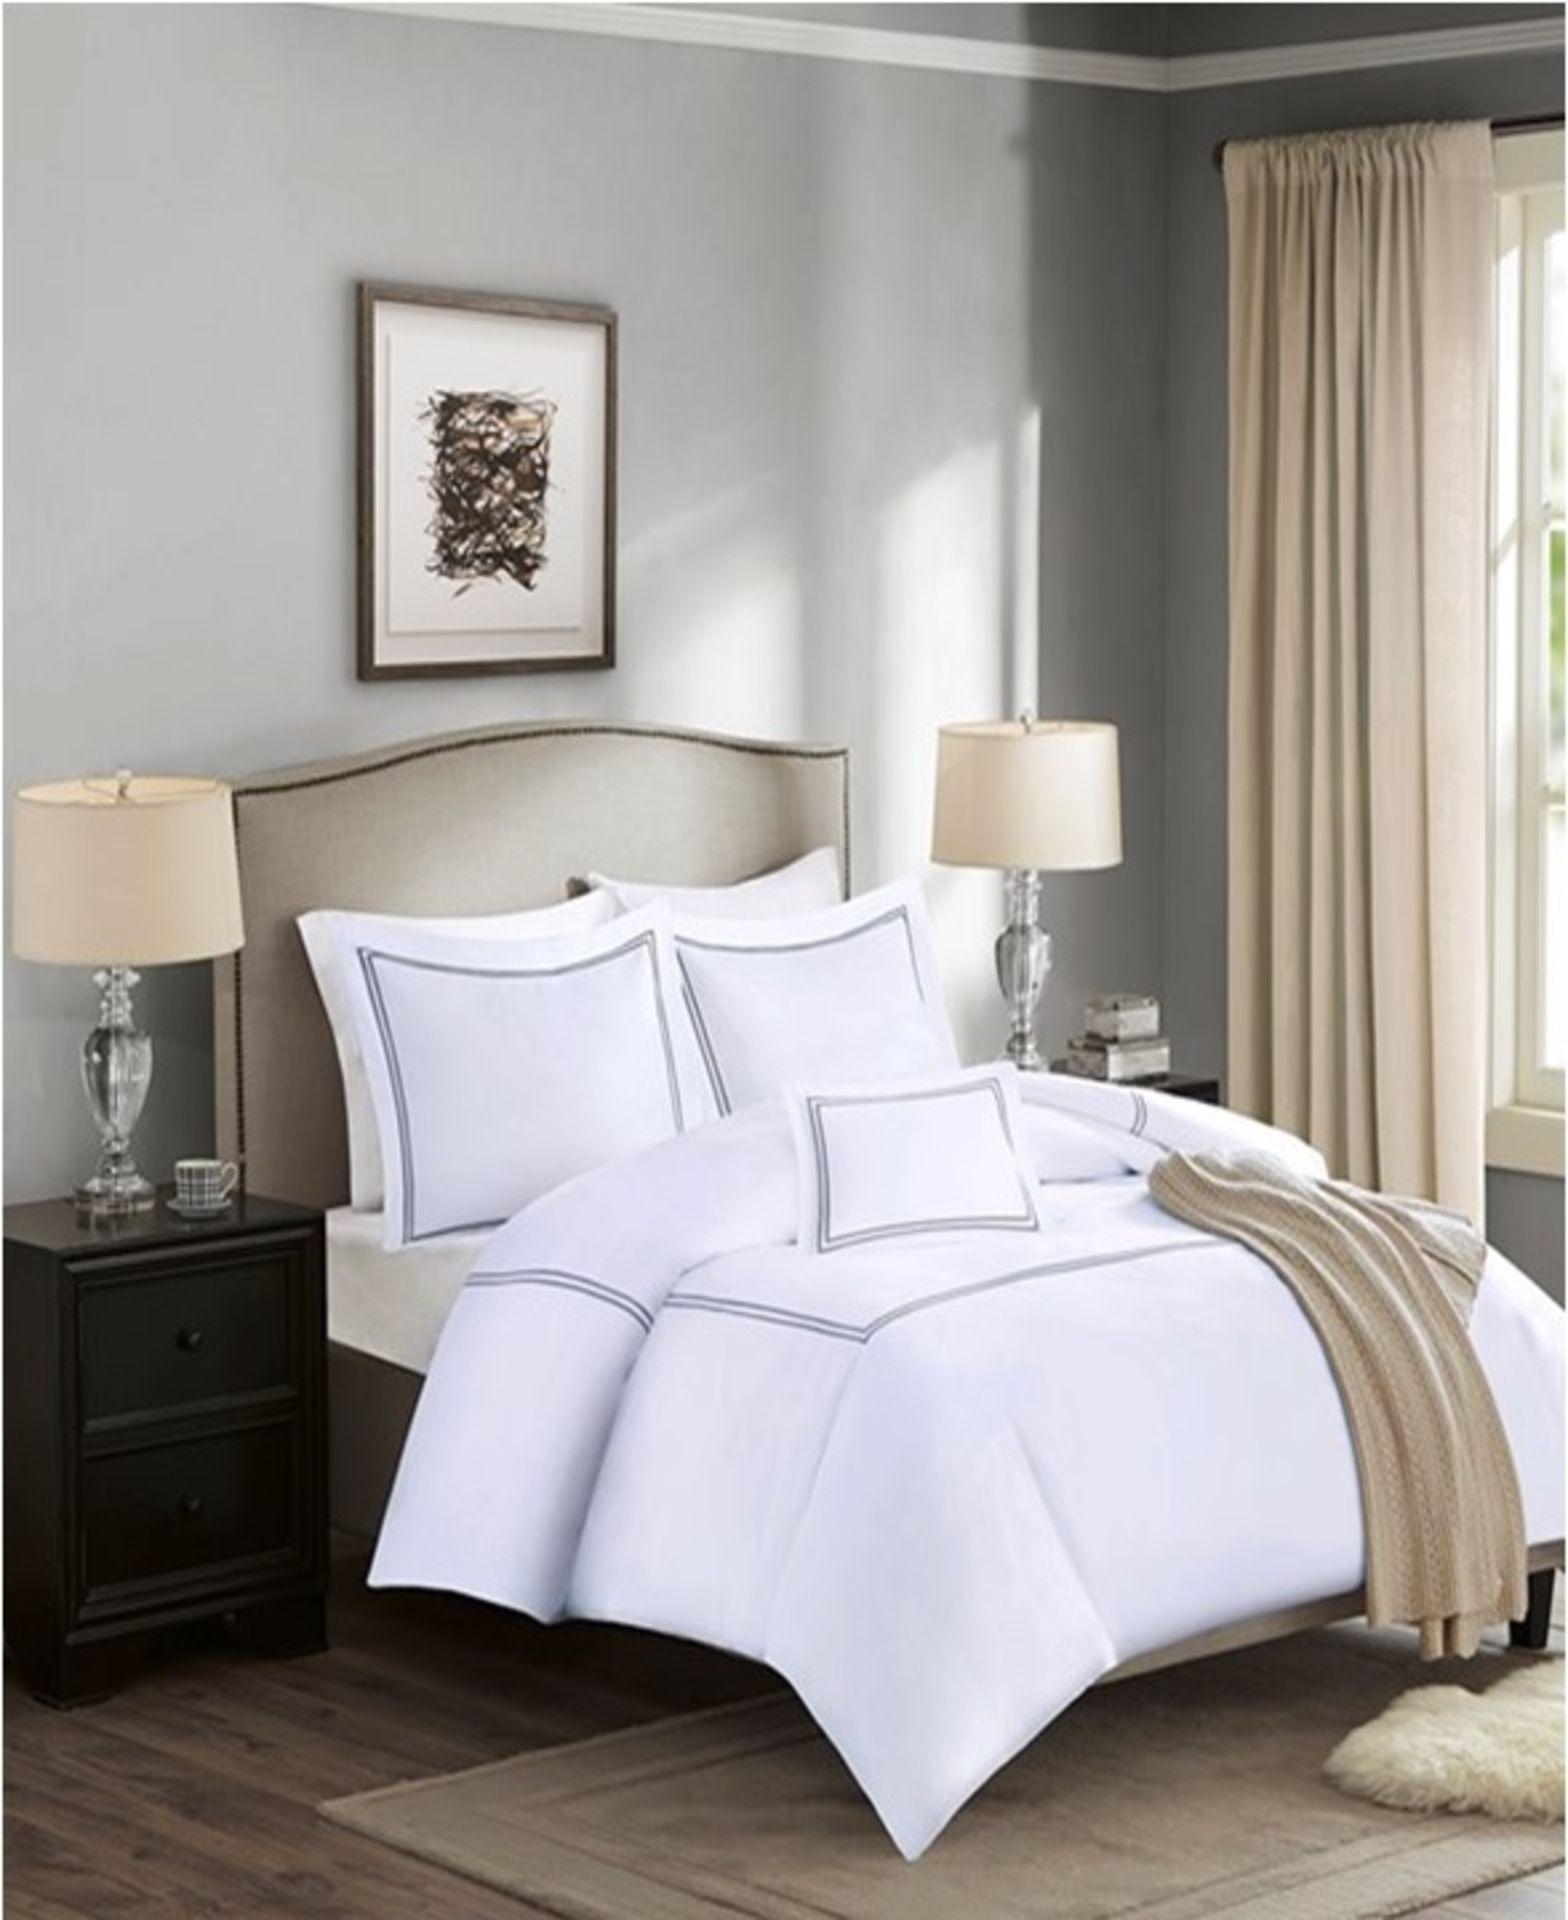 Lot 143 - 1 x Madison Park Luxury Collection Single Duvet Set White - Product Code MP12-0197UK (Brand New -